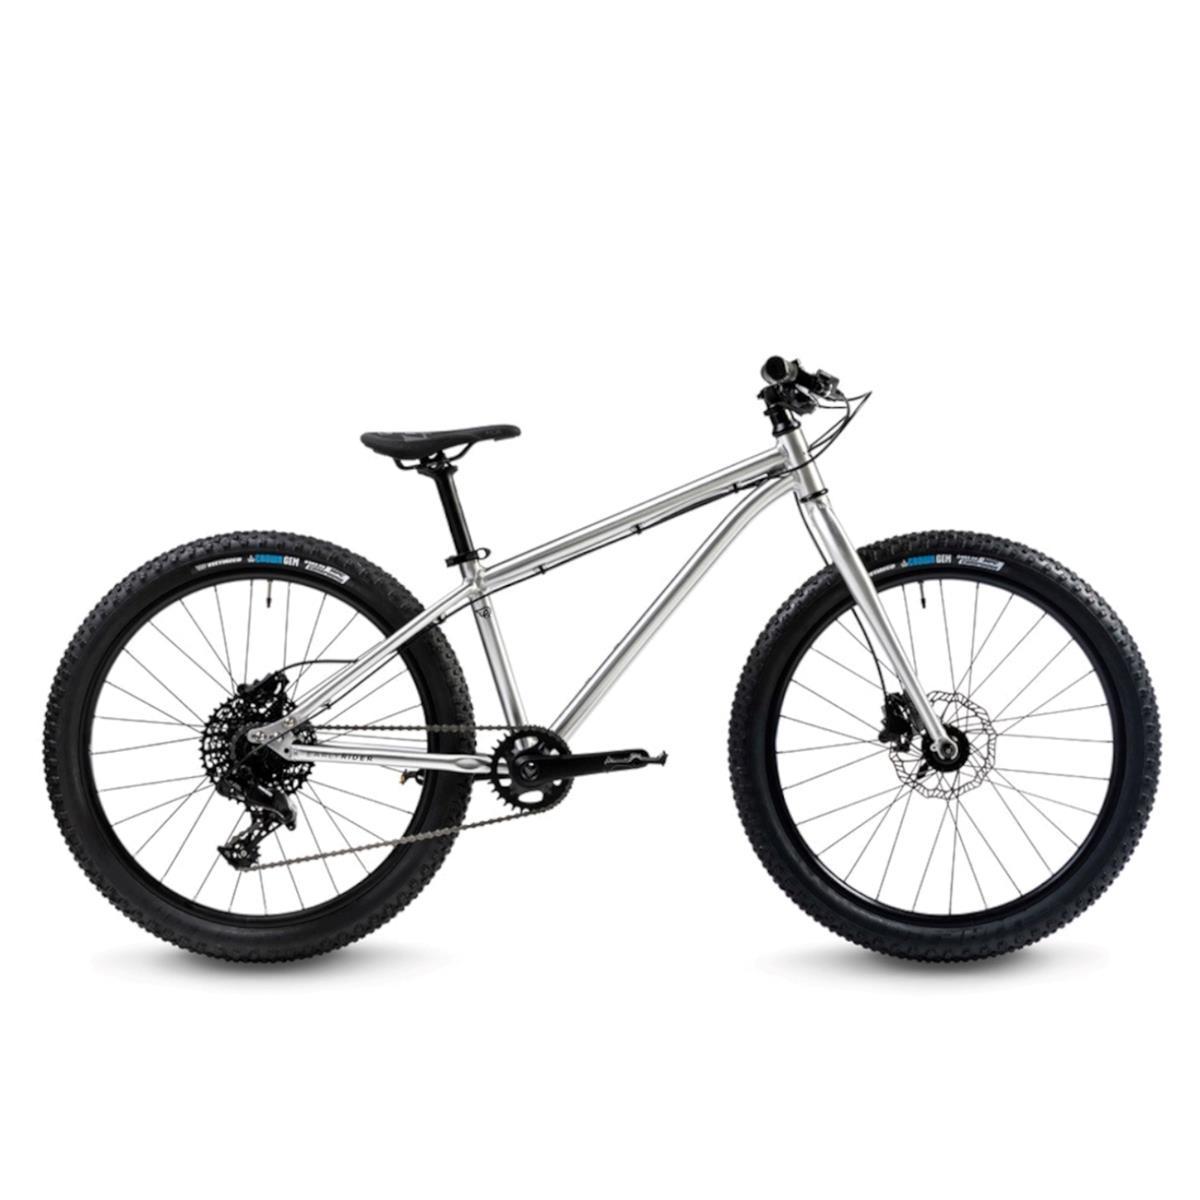 Sattelstützenklemme Gestell Halterung Werkzeuge Befestigung Fahrrad MTB